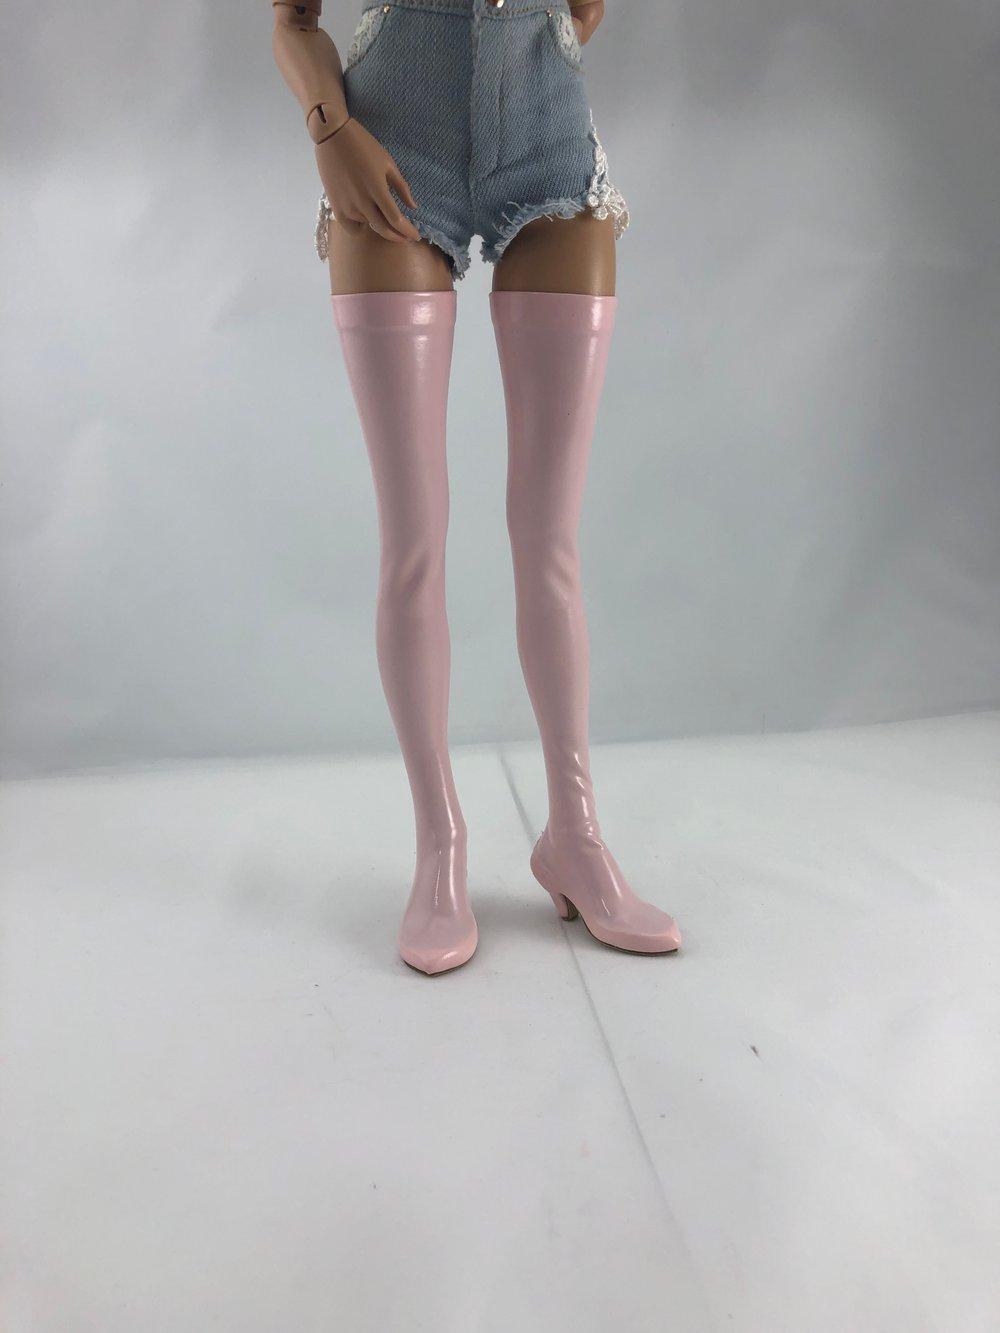 Pink Patent Thigh High Boots: Minifee